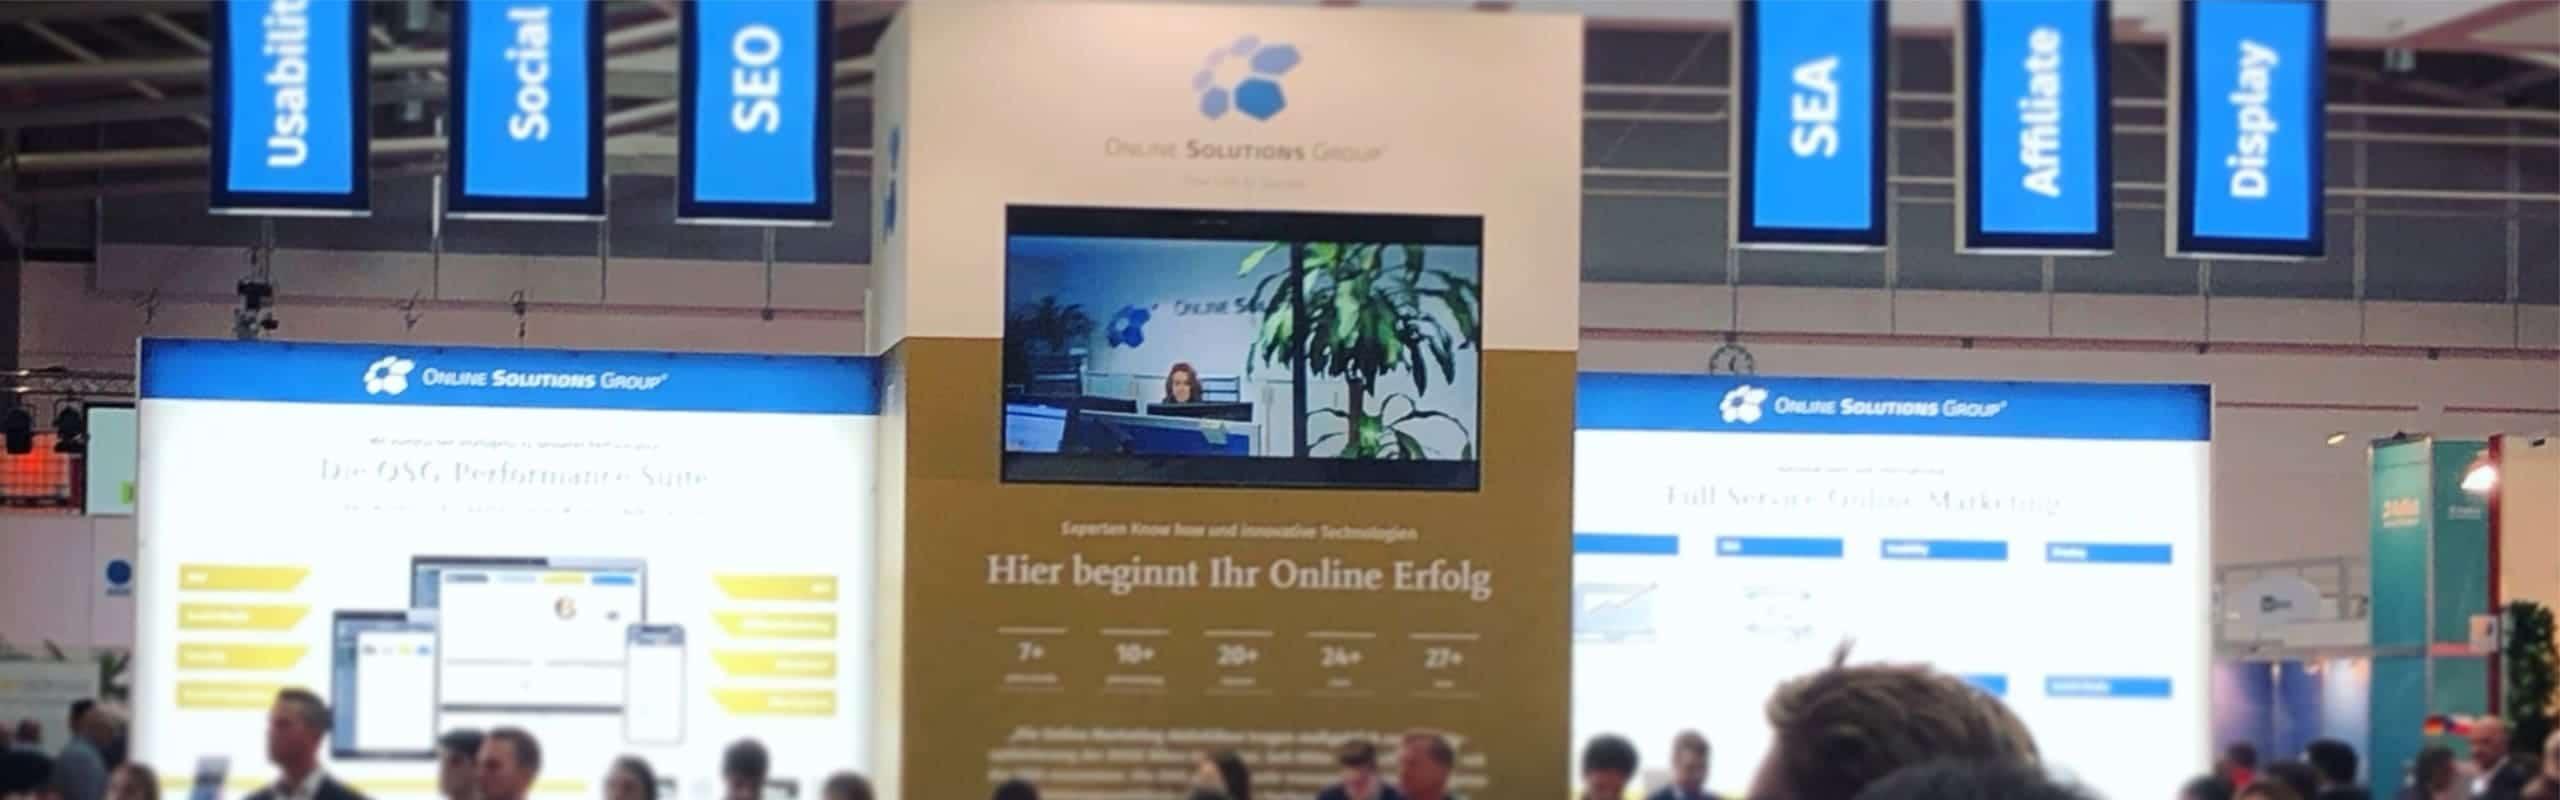 SEO Agentur Bonn